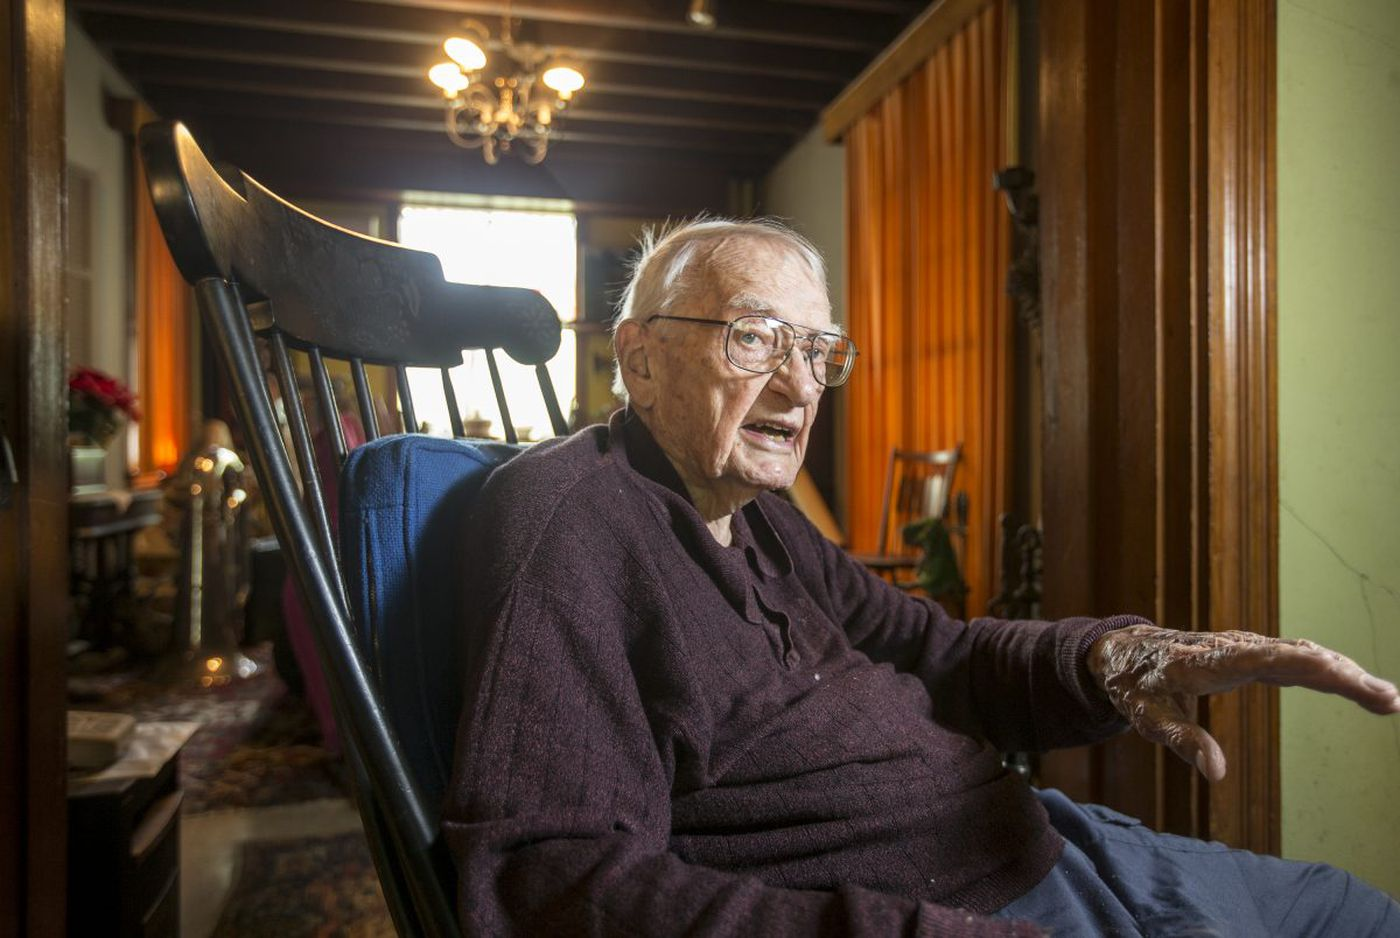 Camden-born illustrator, turning 100, left his mark on Nazi trials   Stu Bykofsky